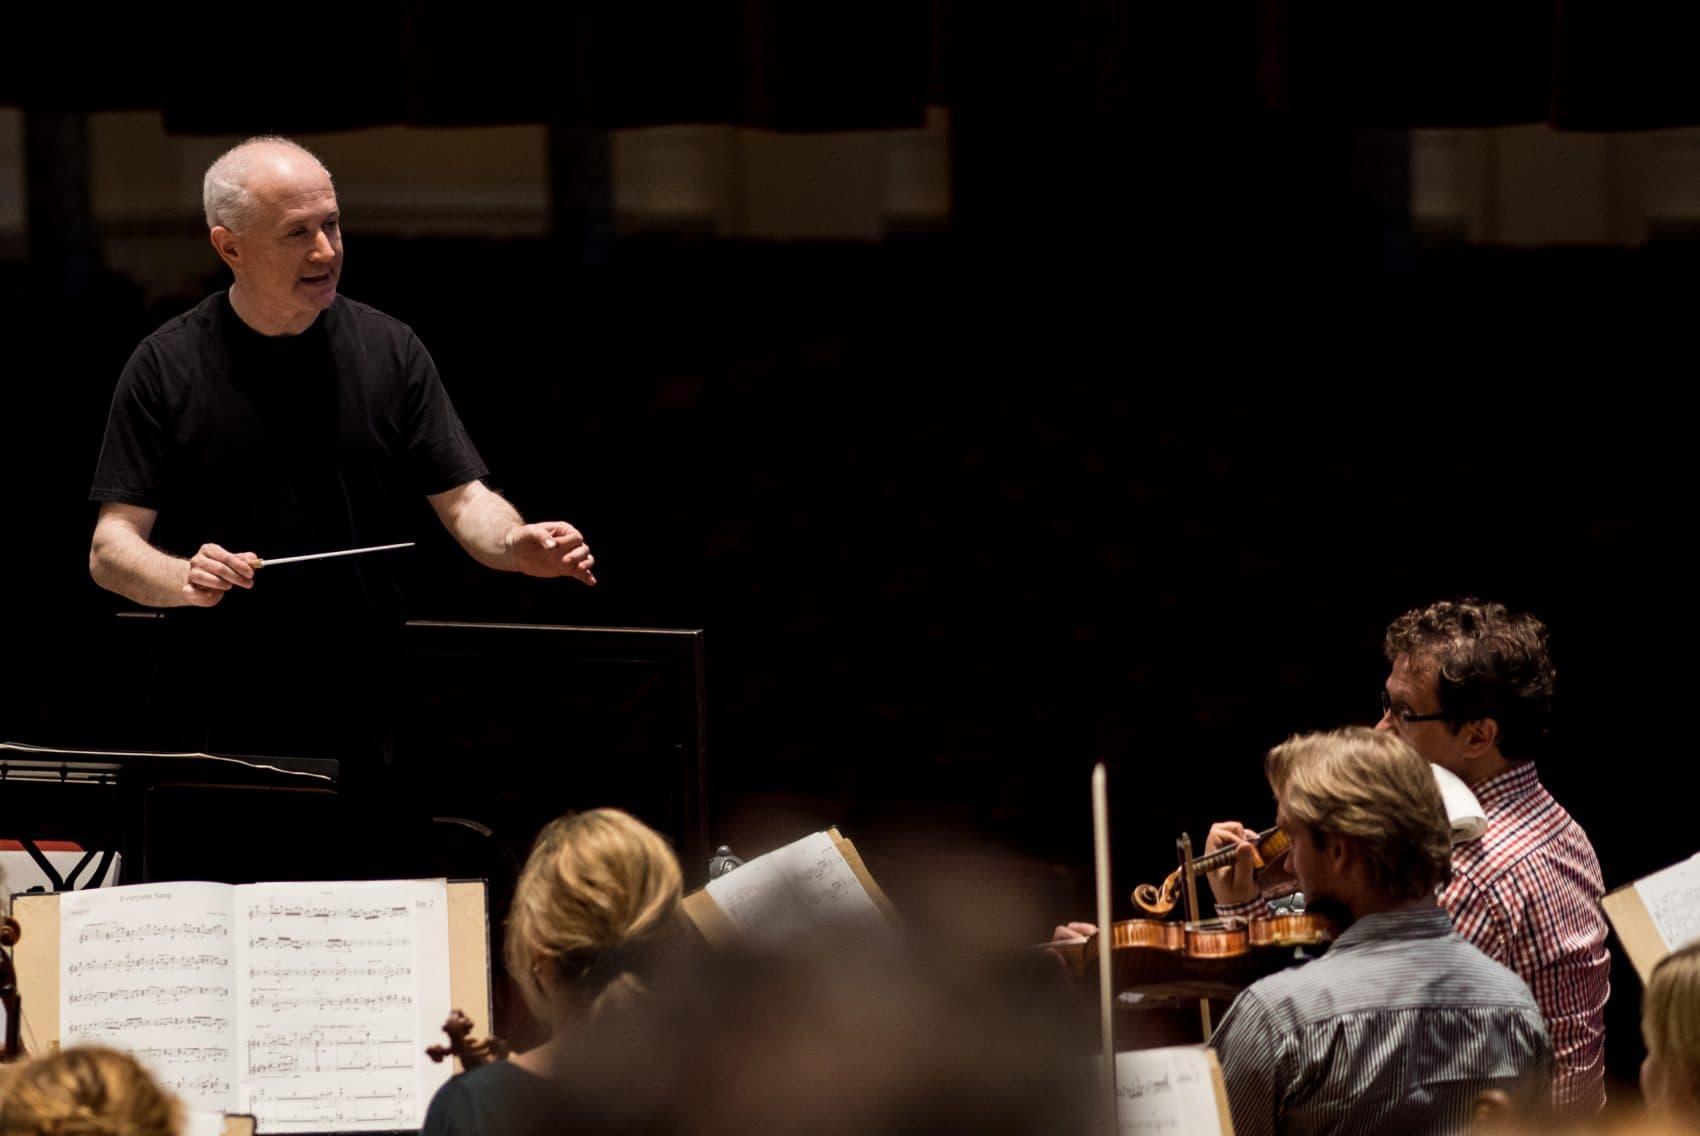 Conductor George Benjamin. (Courtesy Renske Vrolijk/Royal Concertgebouw Orchestra)